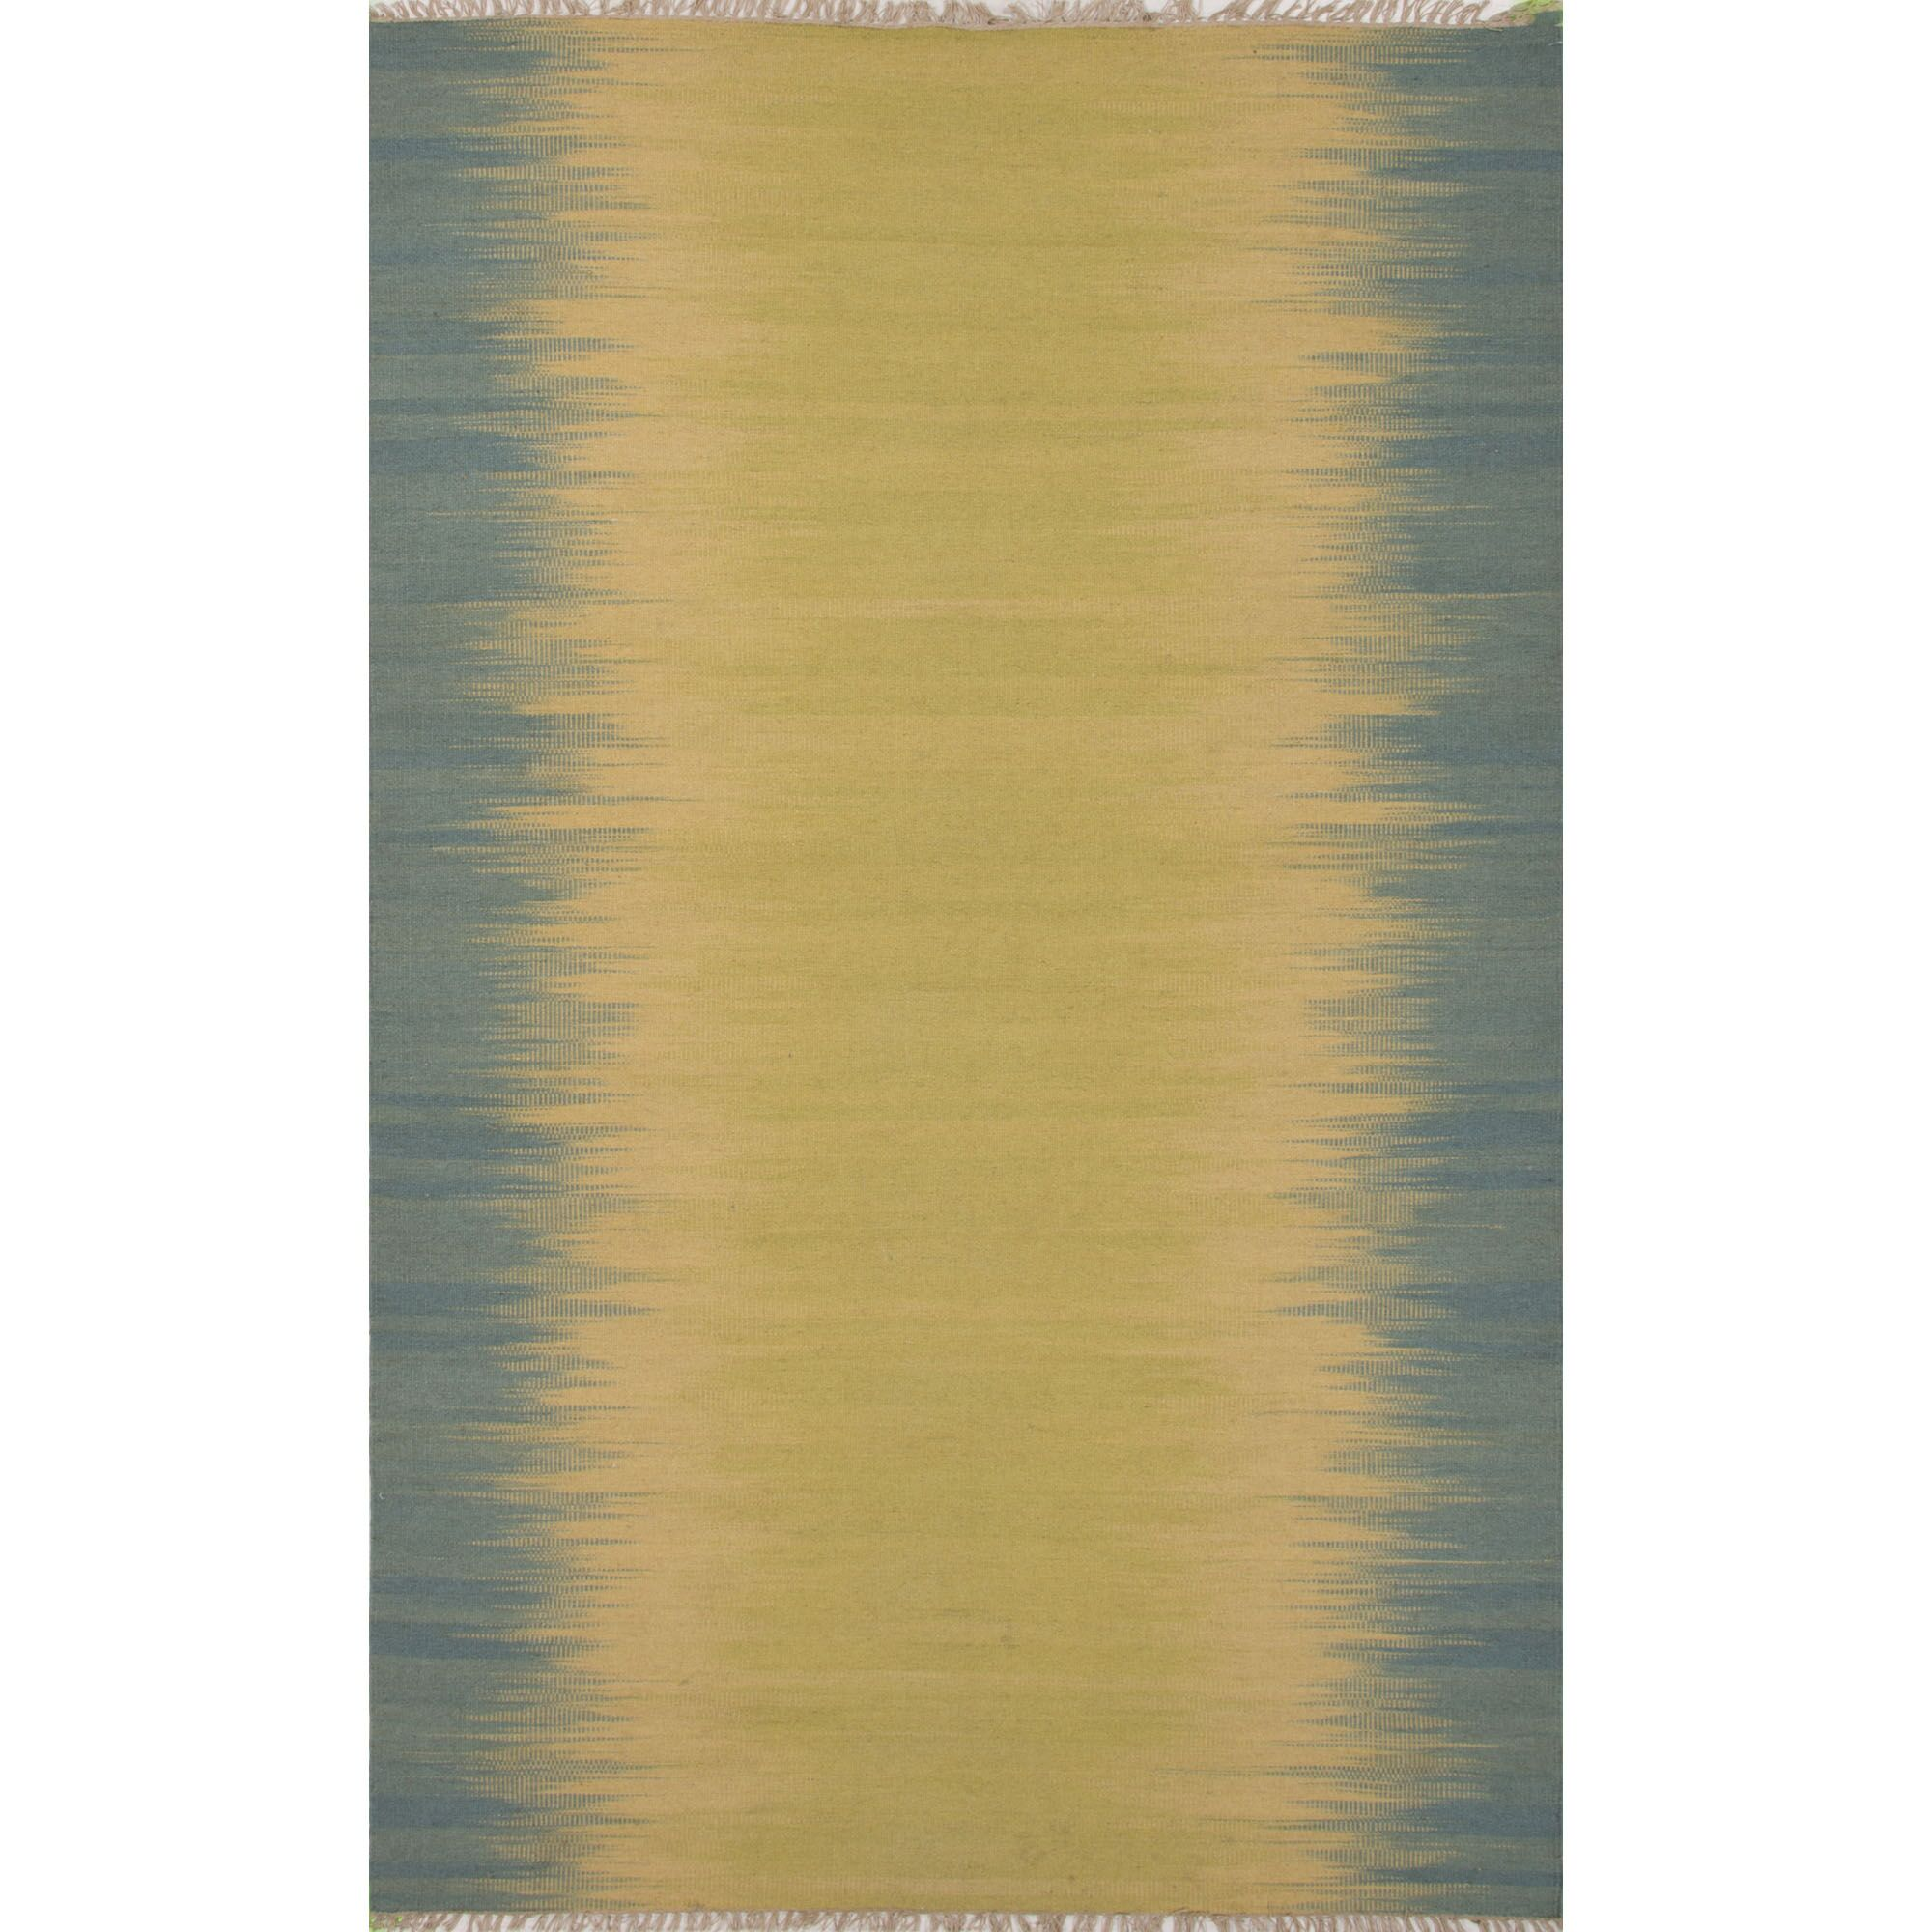 Pilkhuwa Linden  Beige/Blue Area Rug Rug Size: 5' x 8'